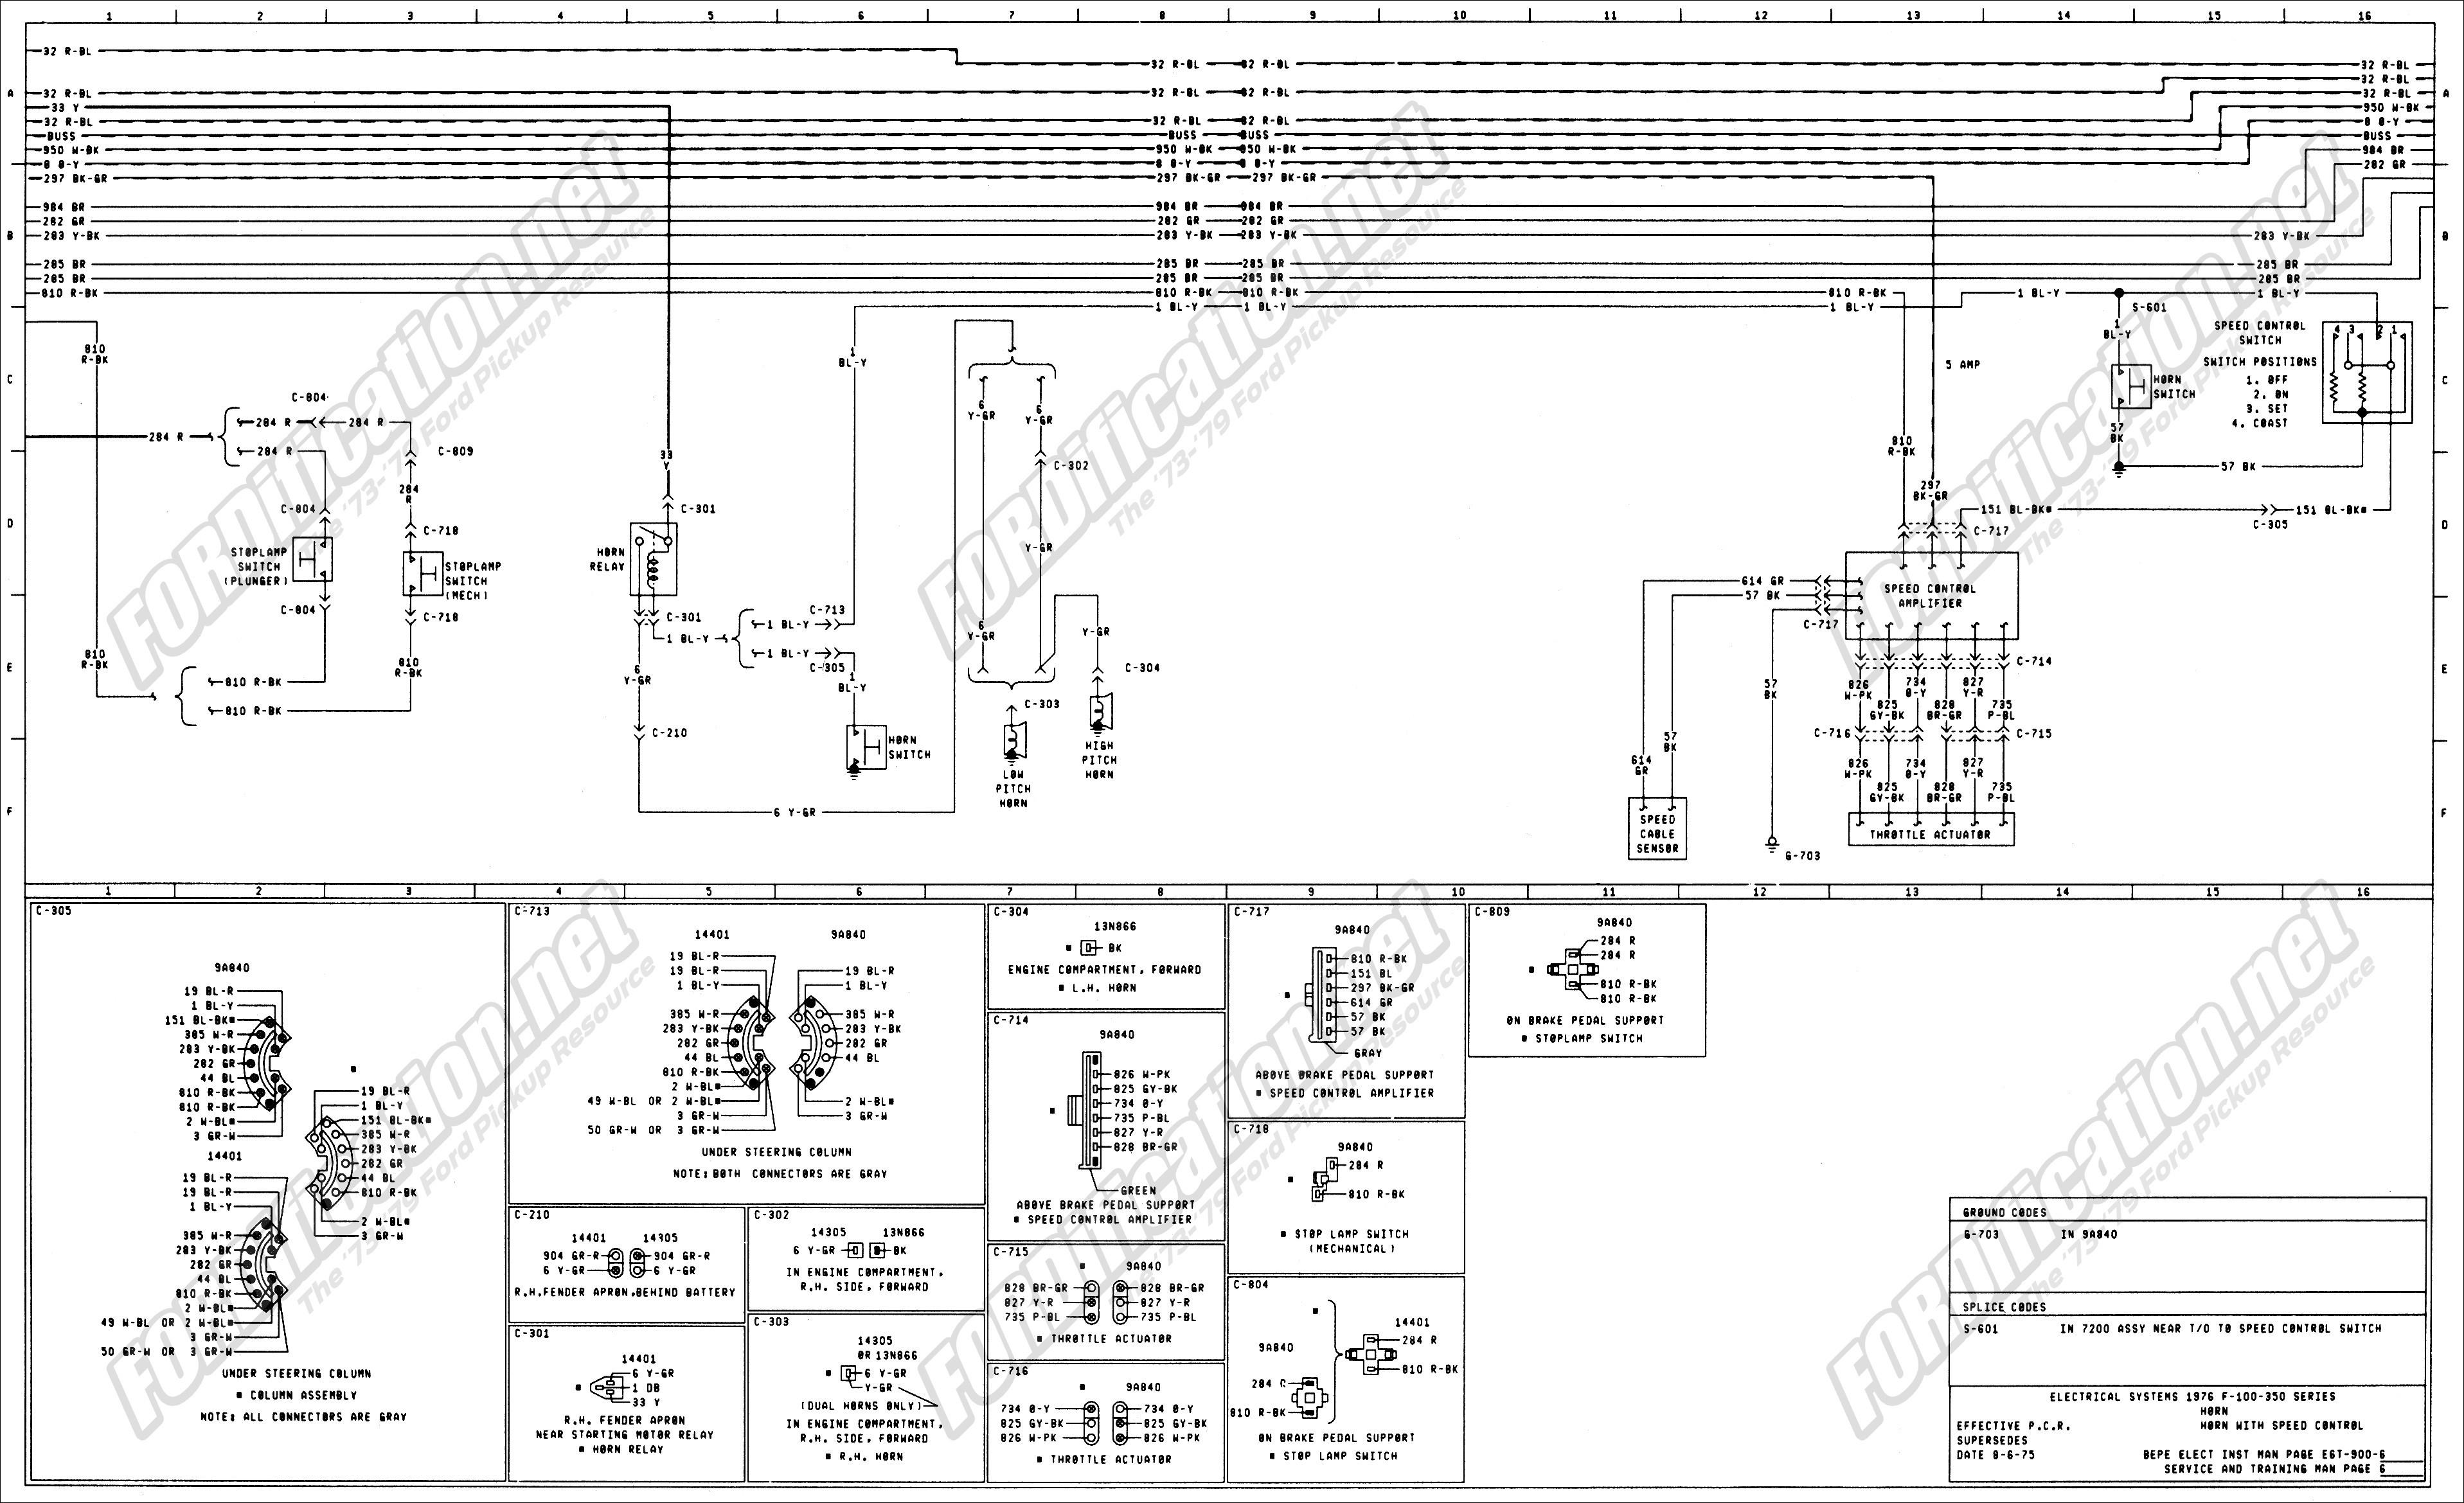 Turn Signal Circuit Diagram Inspirational Turn Signal Wiring Diagram Diagram Of Turn Signal Circuit Diagram